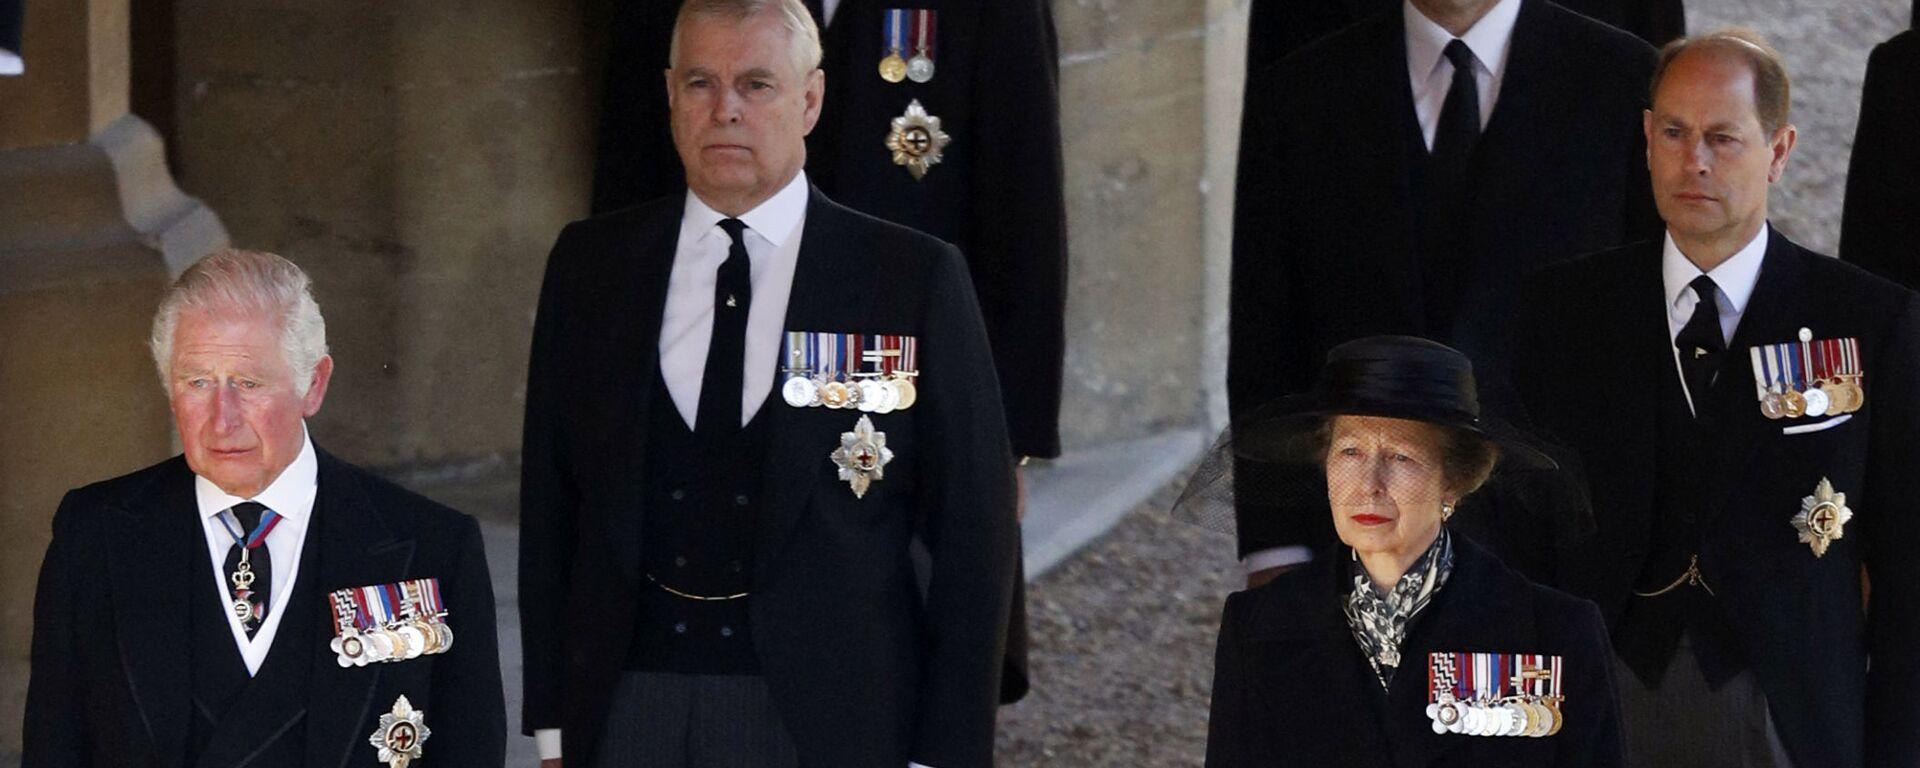 Princ Charles, princezna Anna, princ Andrew, princ Edward, princ William, Peter Phillips na pohřbu prince Philipa - Sputnik Česká republika, 1920, 20.04.2021